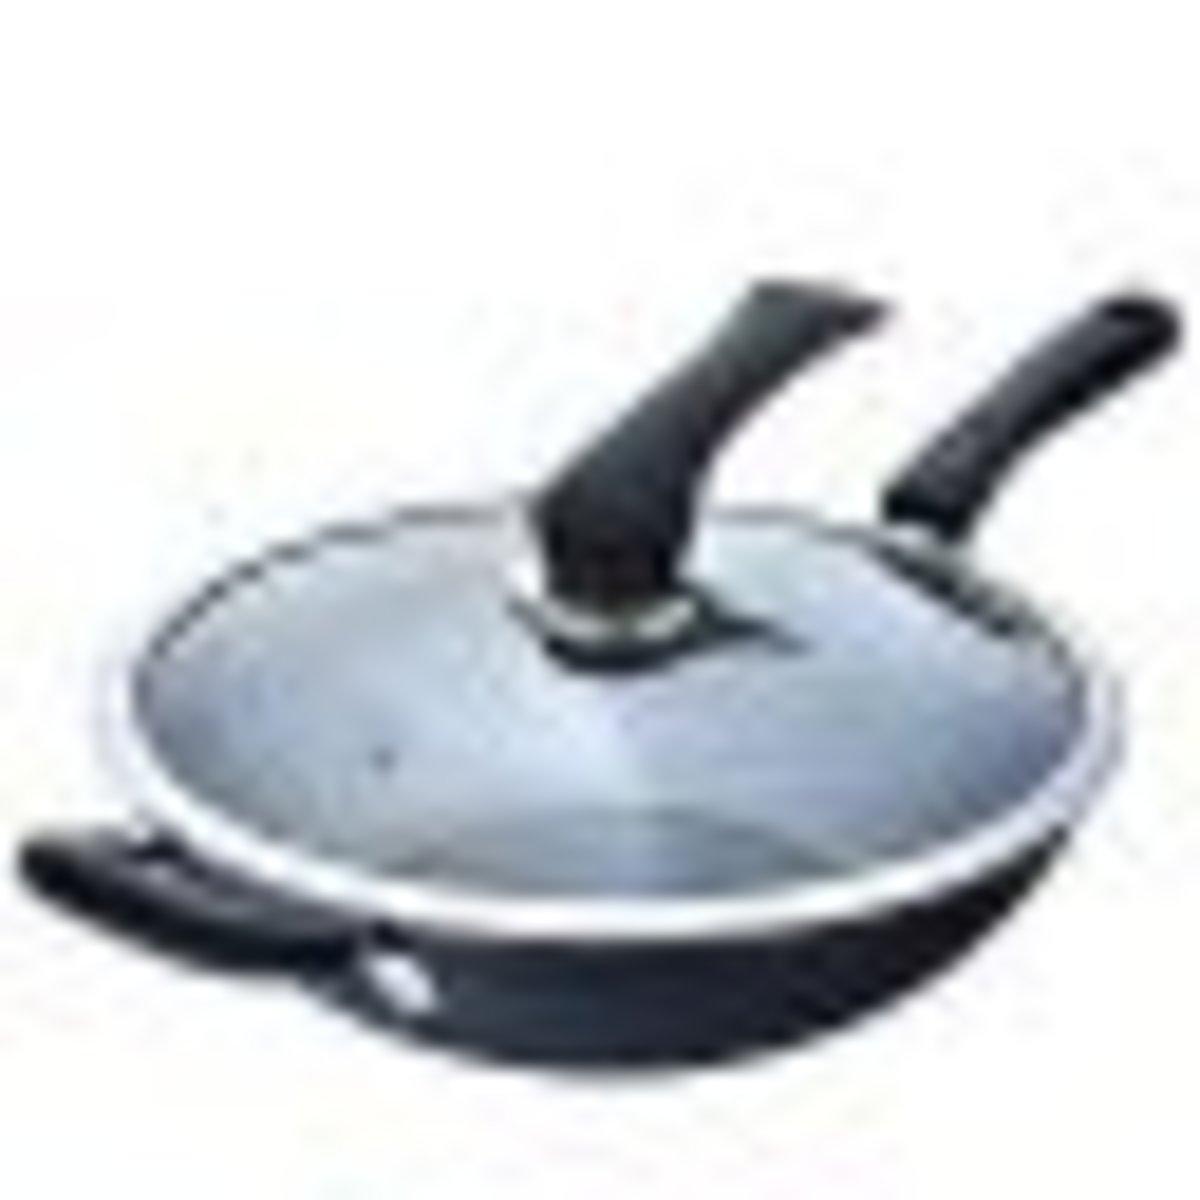 32cm Iron Steel Wok with glass lid